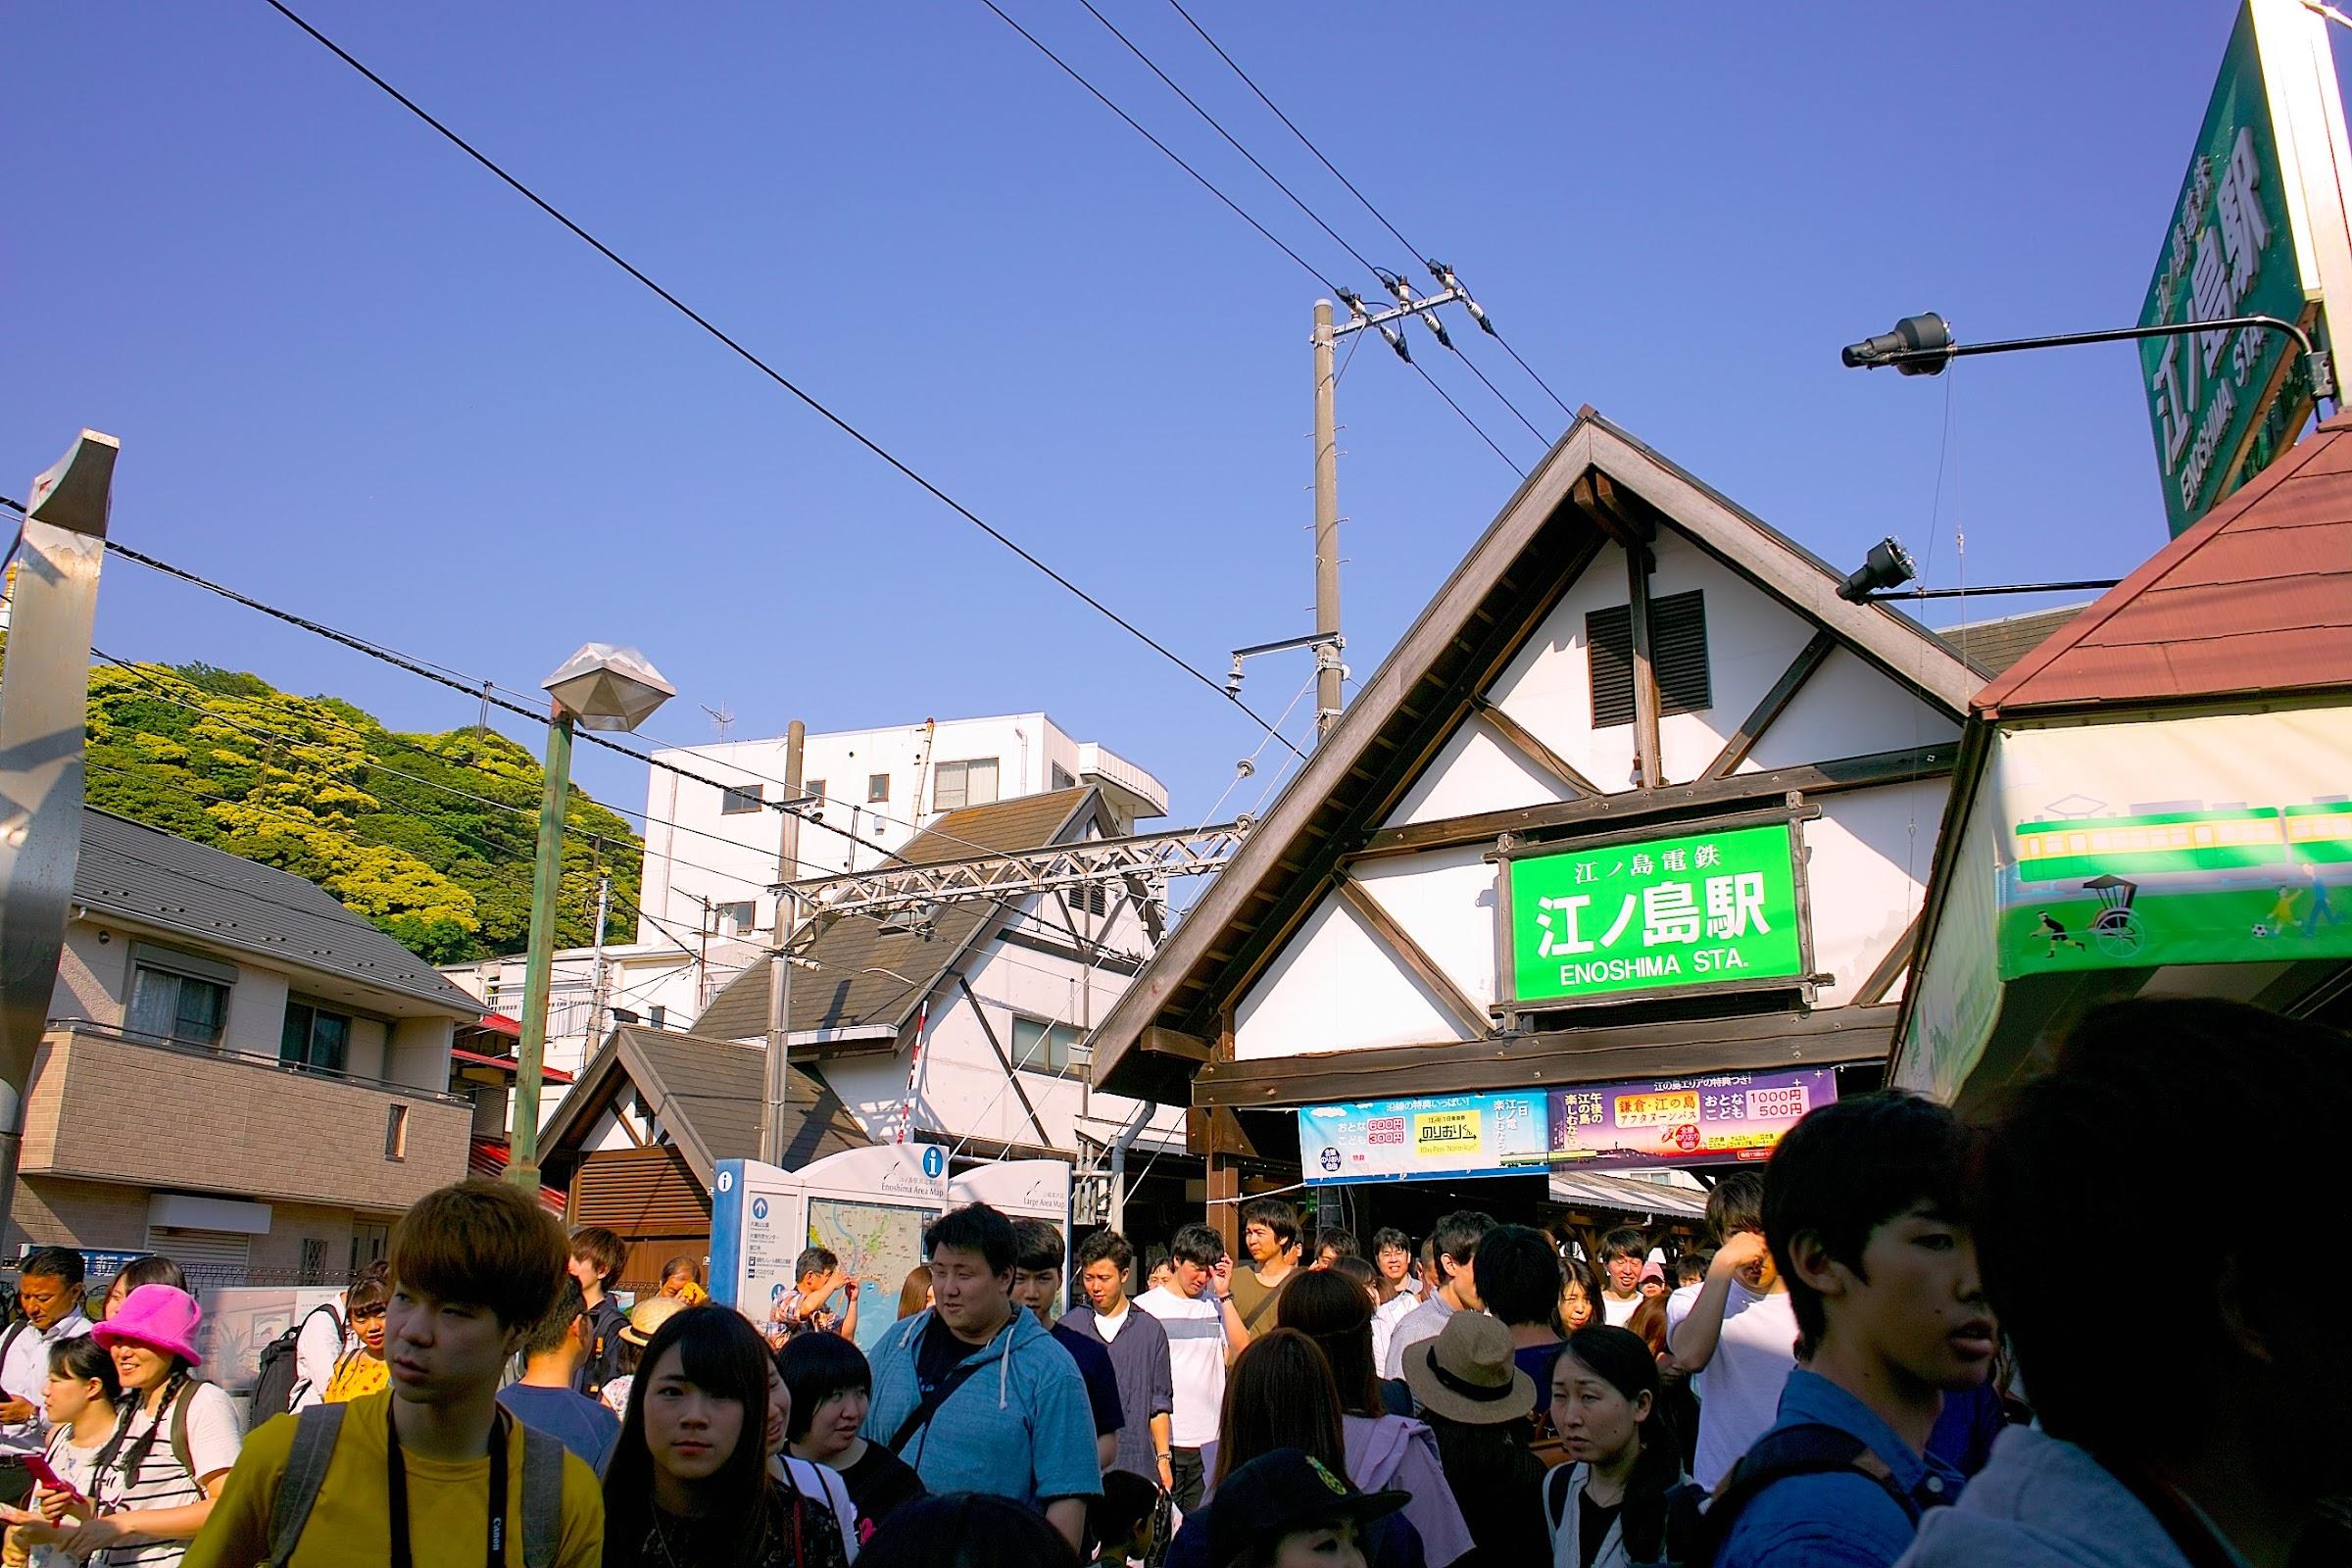 鎌倉、江ノ島駅、DP2、RAW現像